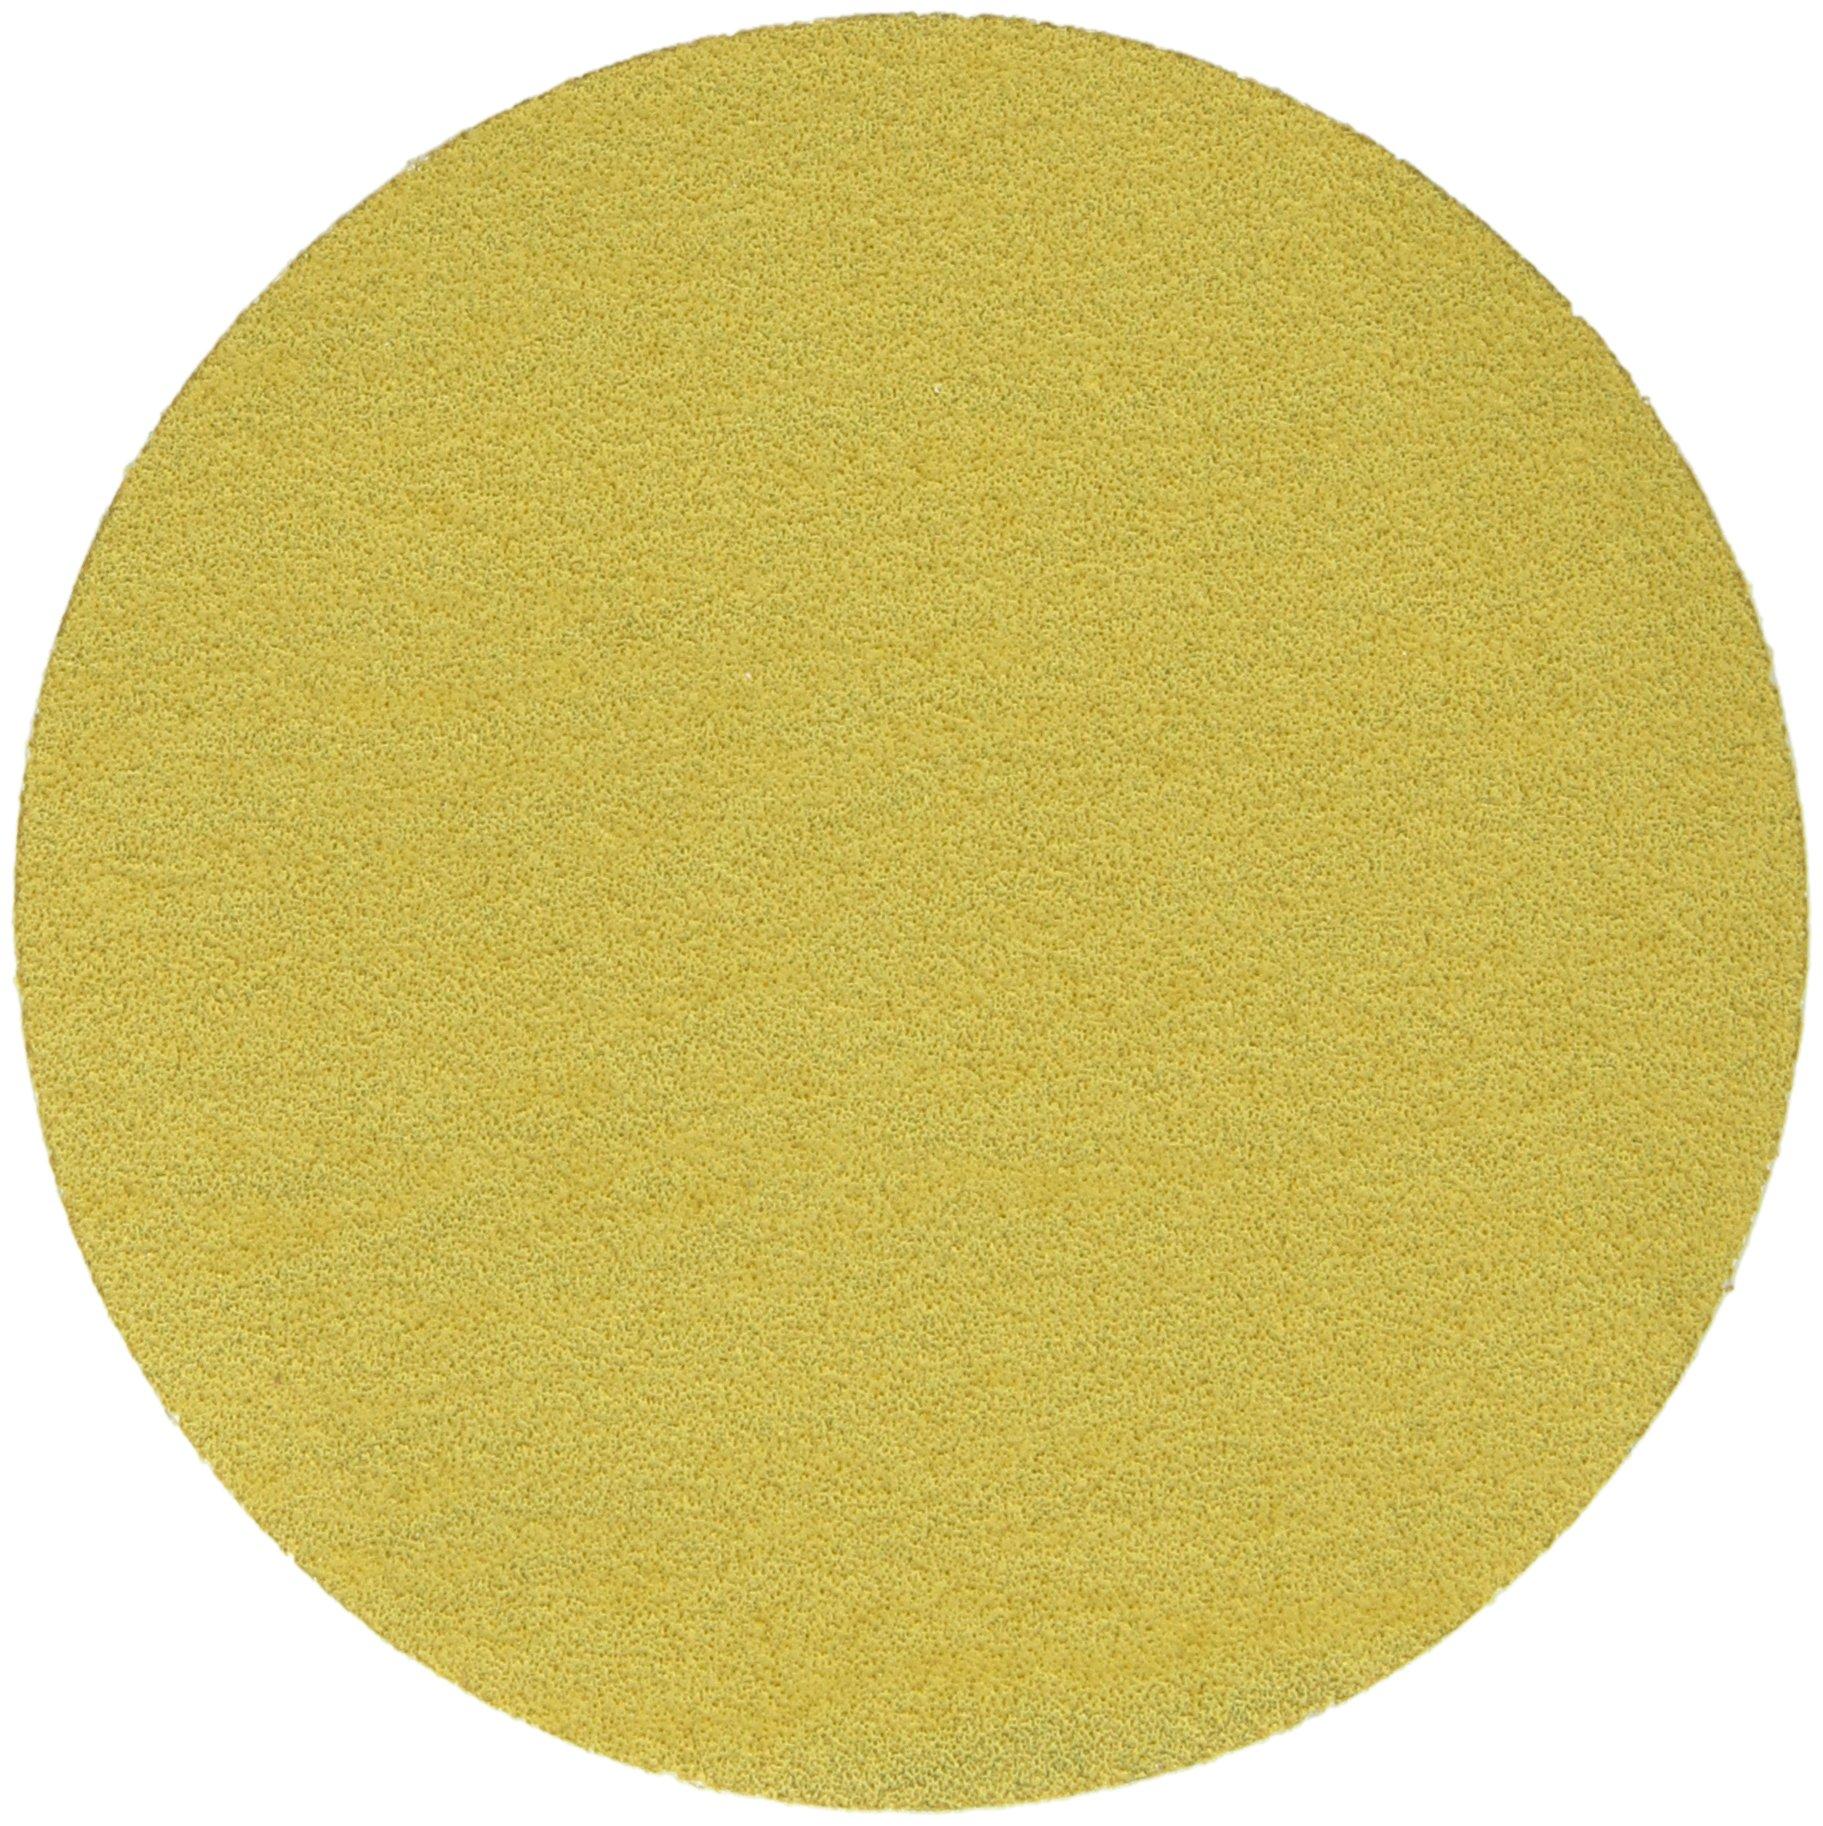 3M Hookit Gold Film Disc 255L, Aluminum Oxide, Dry Only, 5'' Diameter, P80 Grit, Gold (Pack of 1)